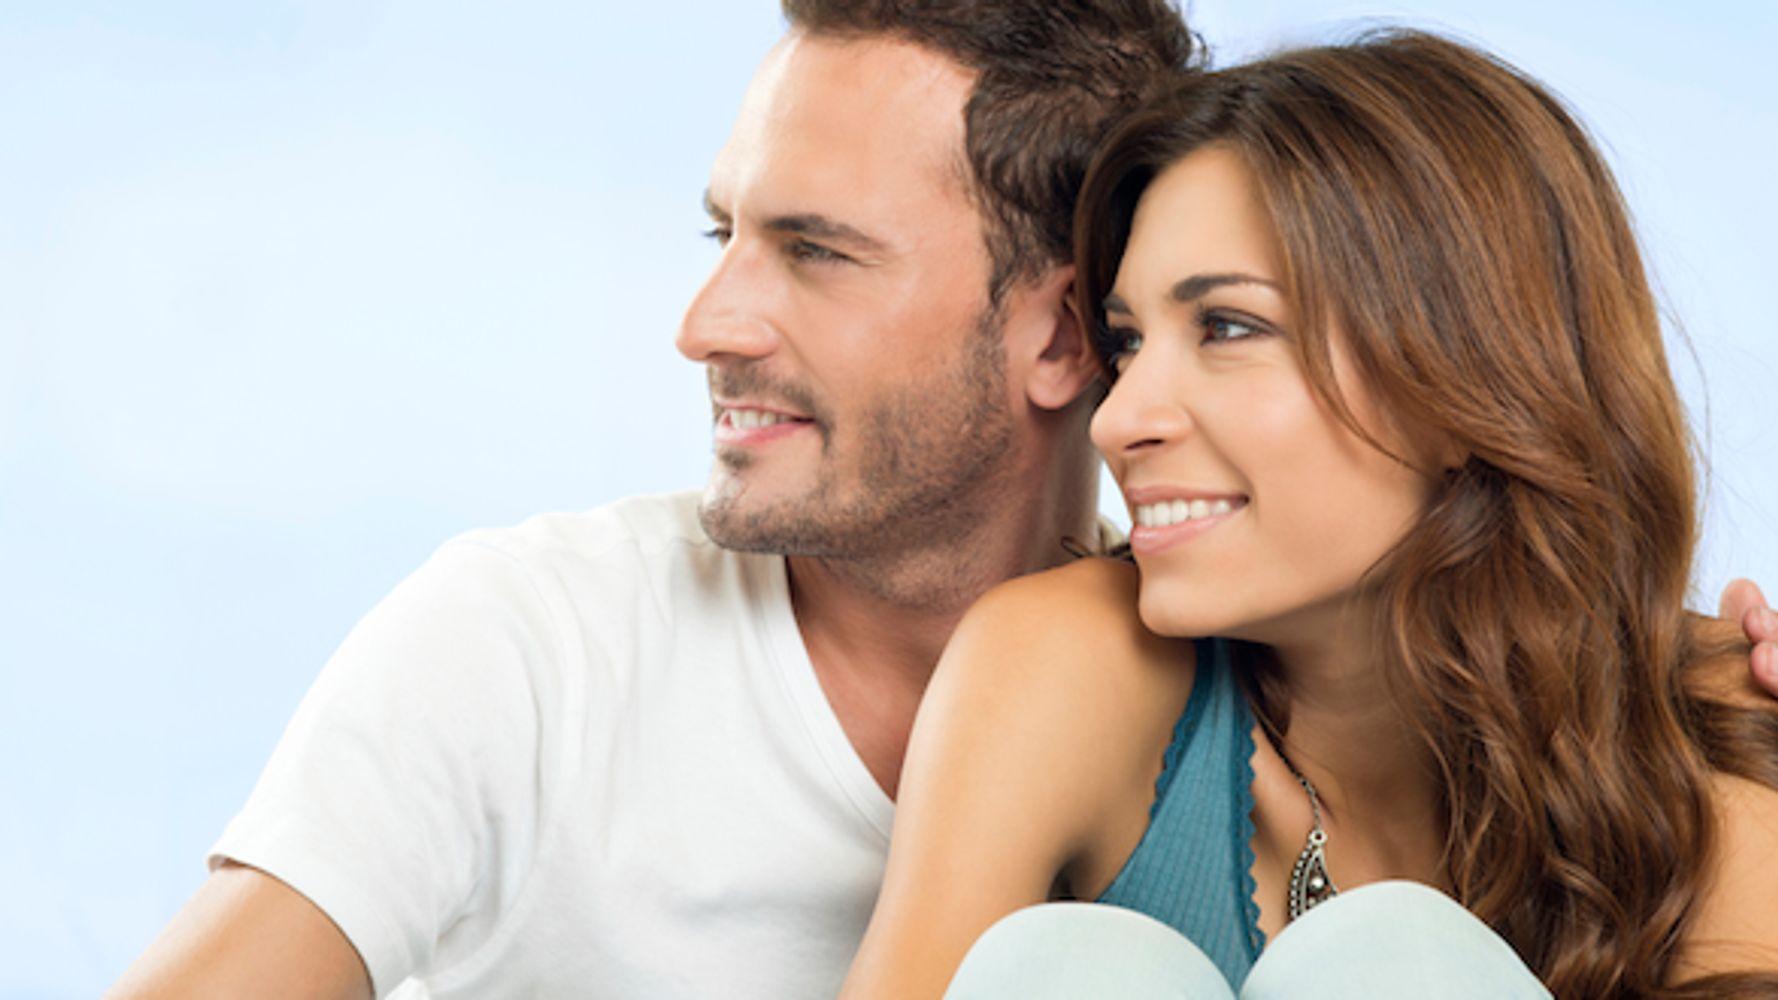 Scared of online dating is lauren london dating lil wayne